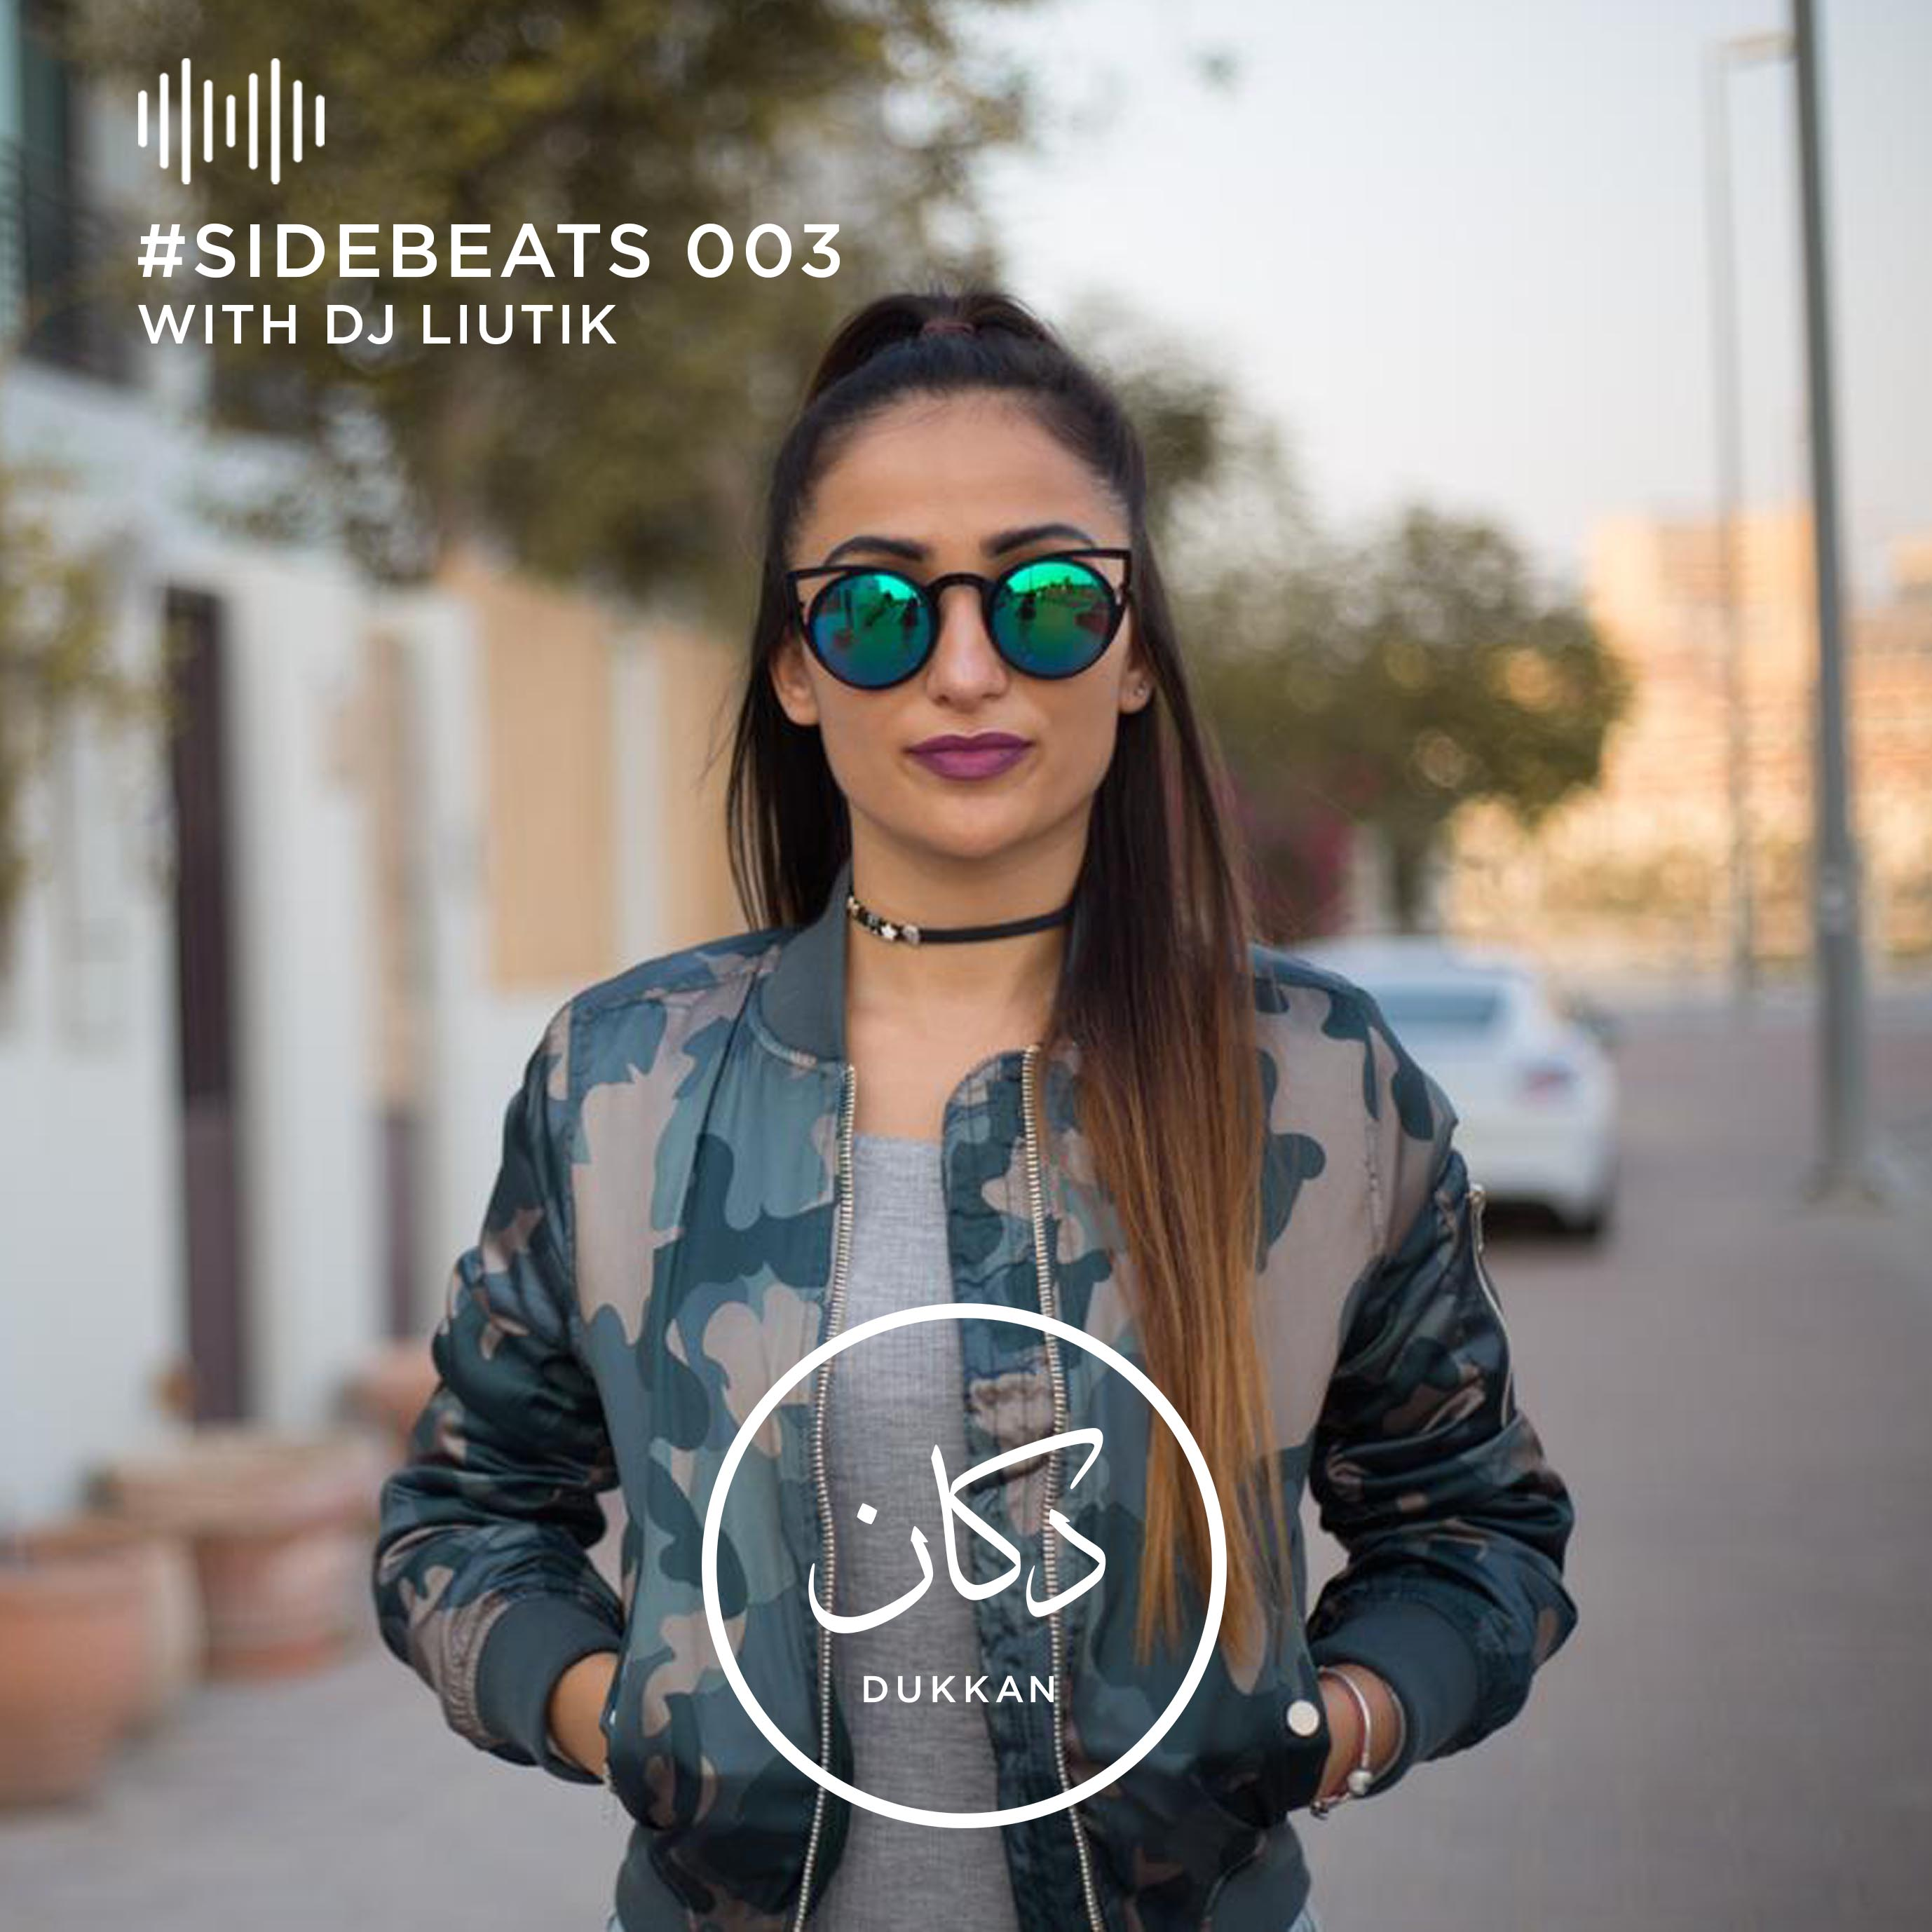 E128: #SideBeats 003  With DJ Liutik